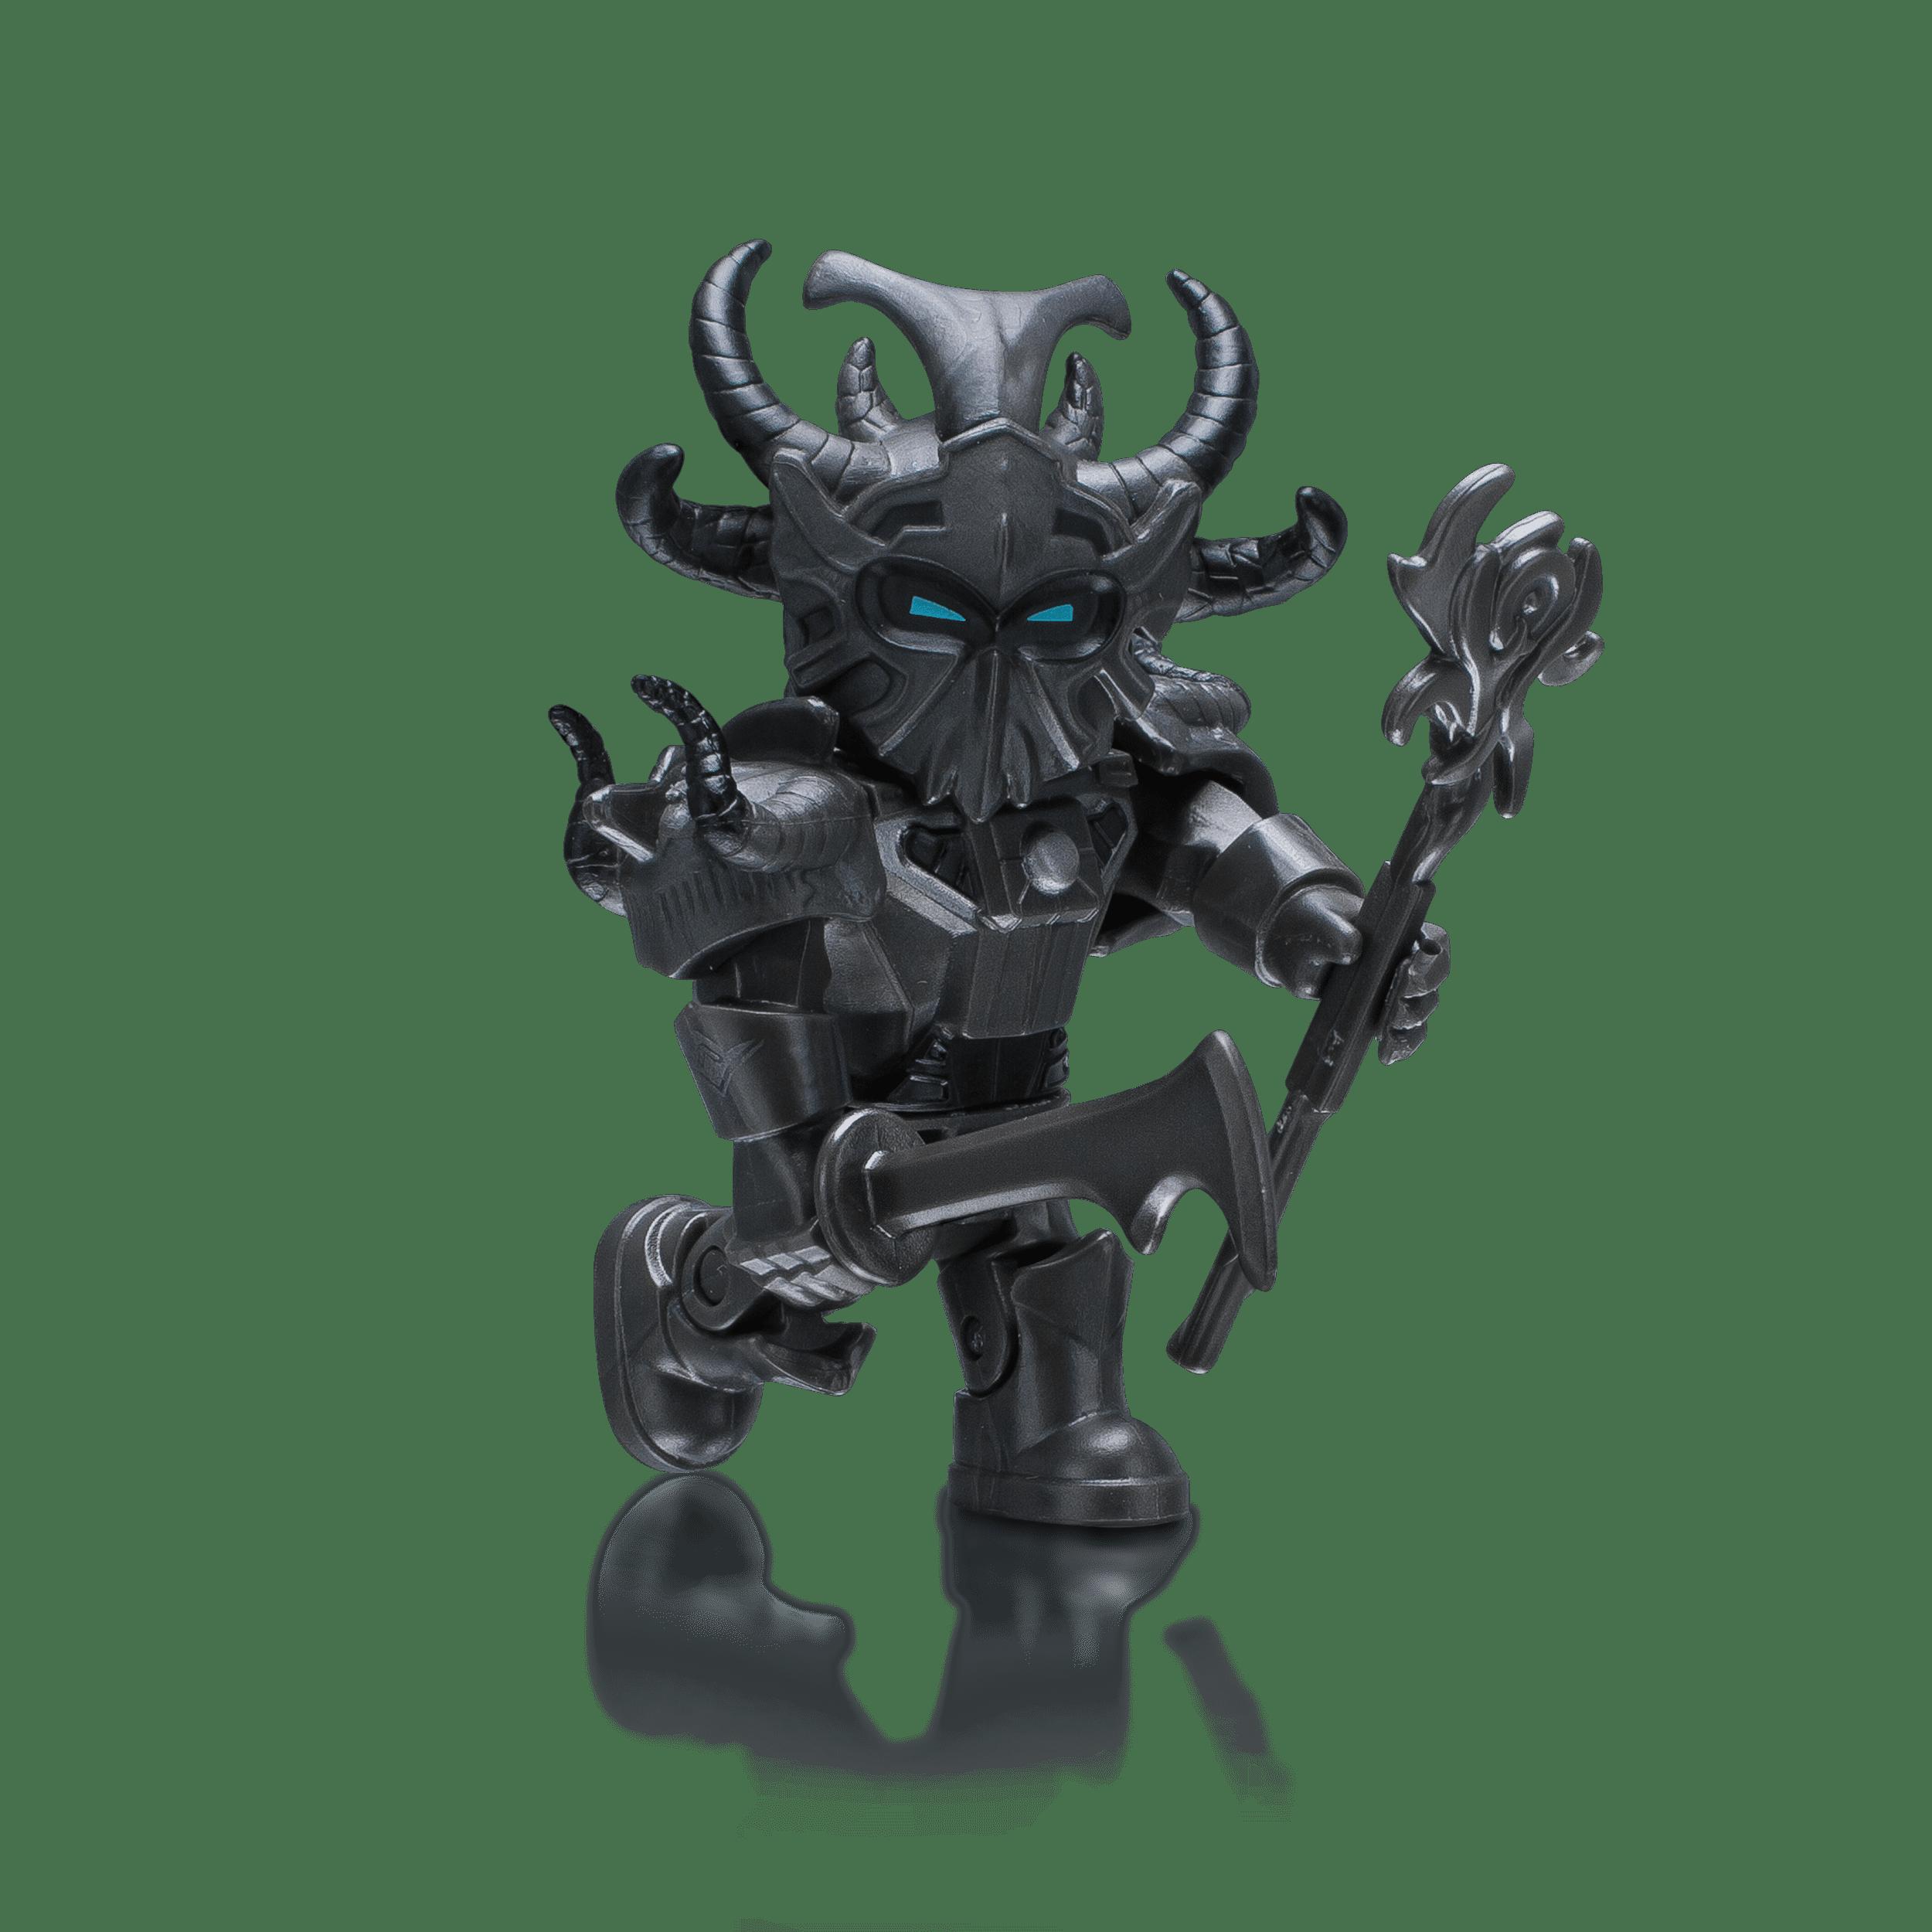 Soundwave Roblox Roblox Action Collection Monster Islands Malgorok Zyth Figure Pack Includes Exclusive Virtual Item Walmart Inventory Checker Brickseek